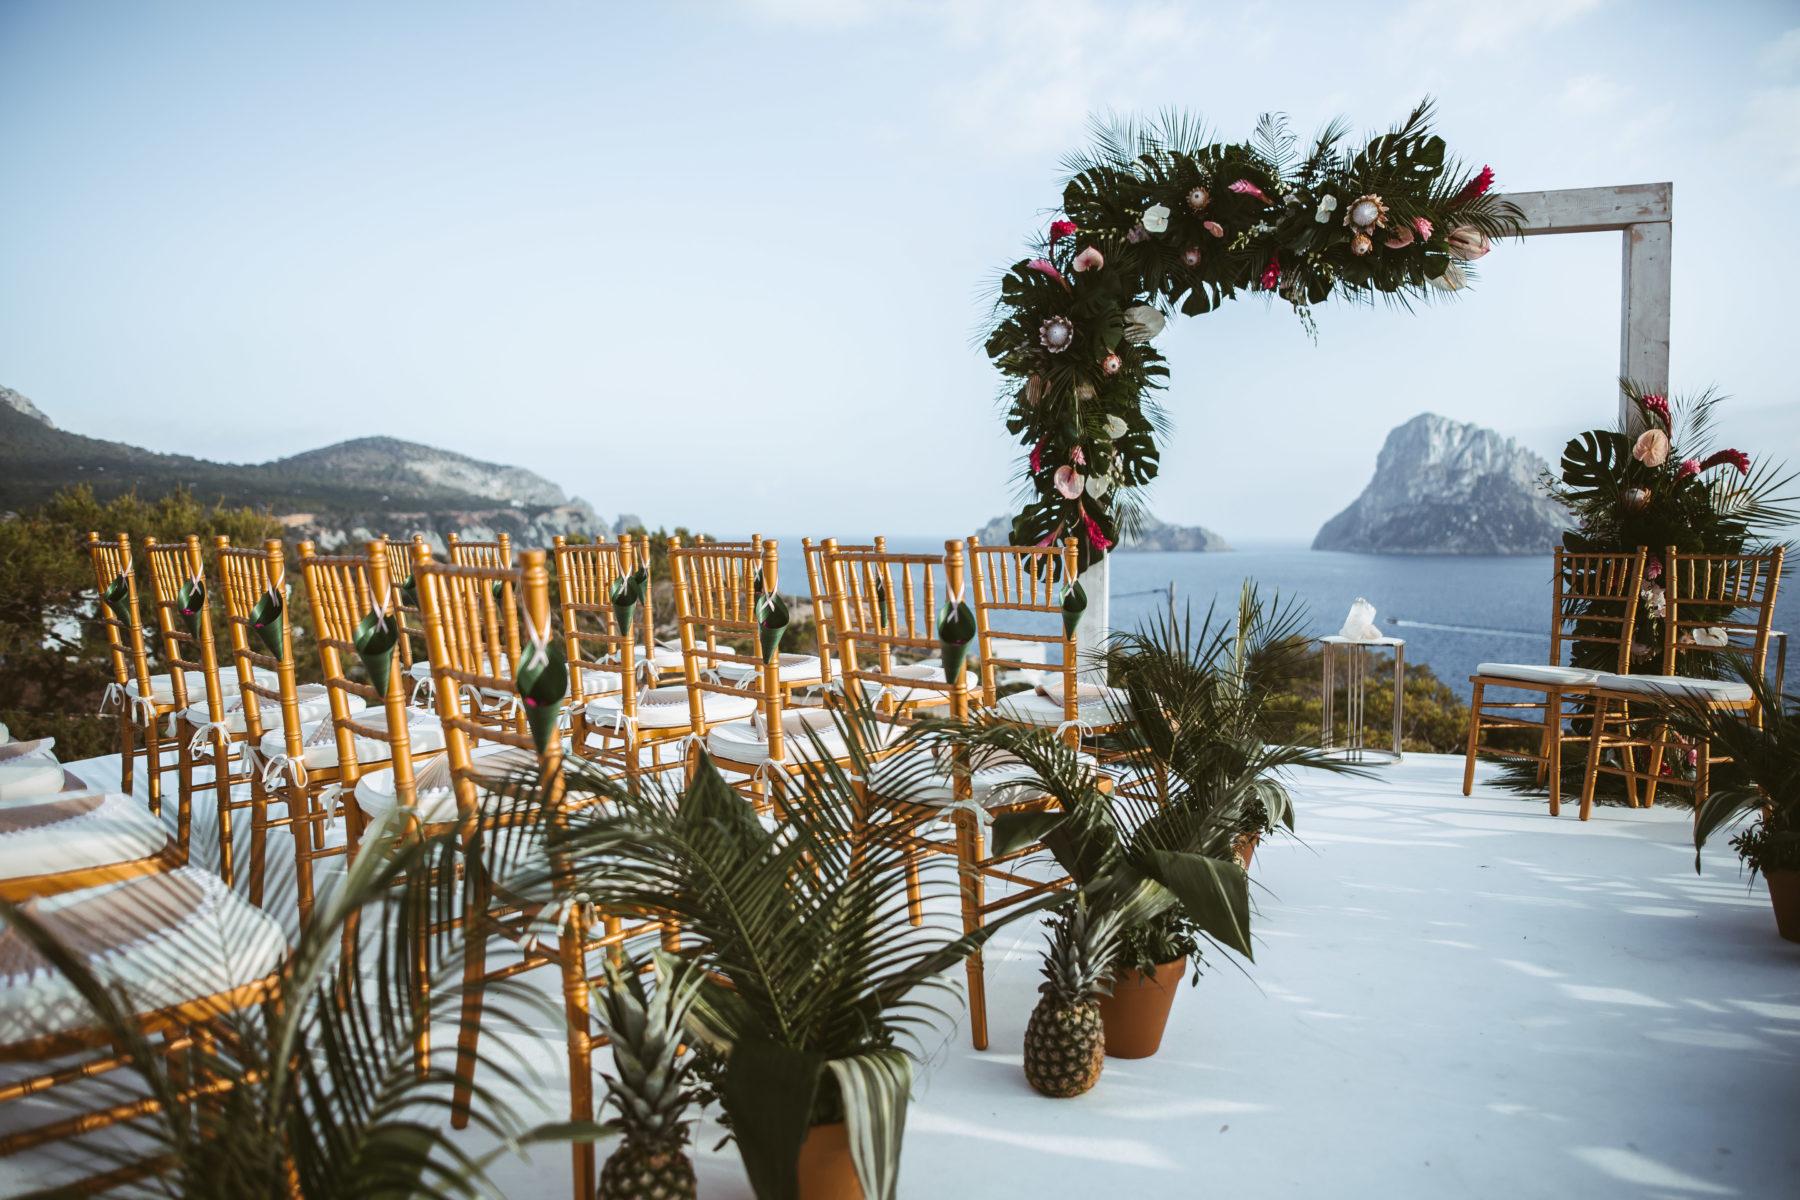 mallorca-hochzeit-ibiza-la-escollera-ibiza-destination-wedding-mallorca-weddings.jpg